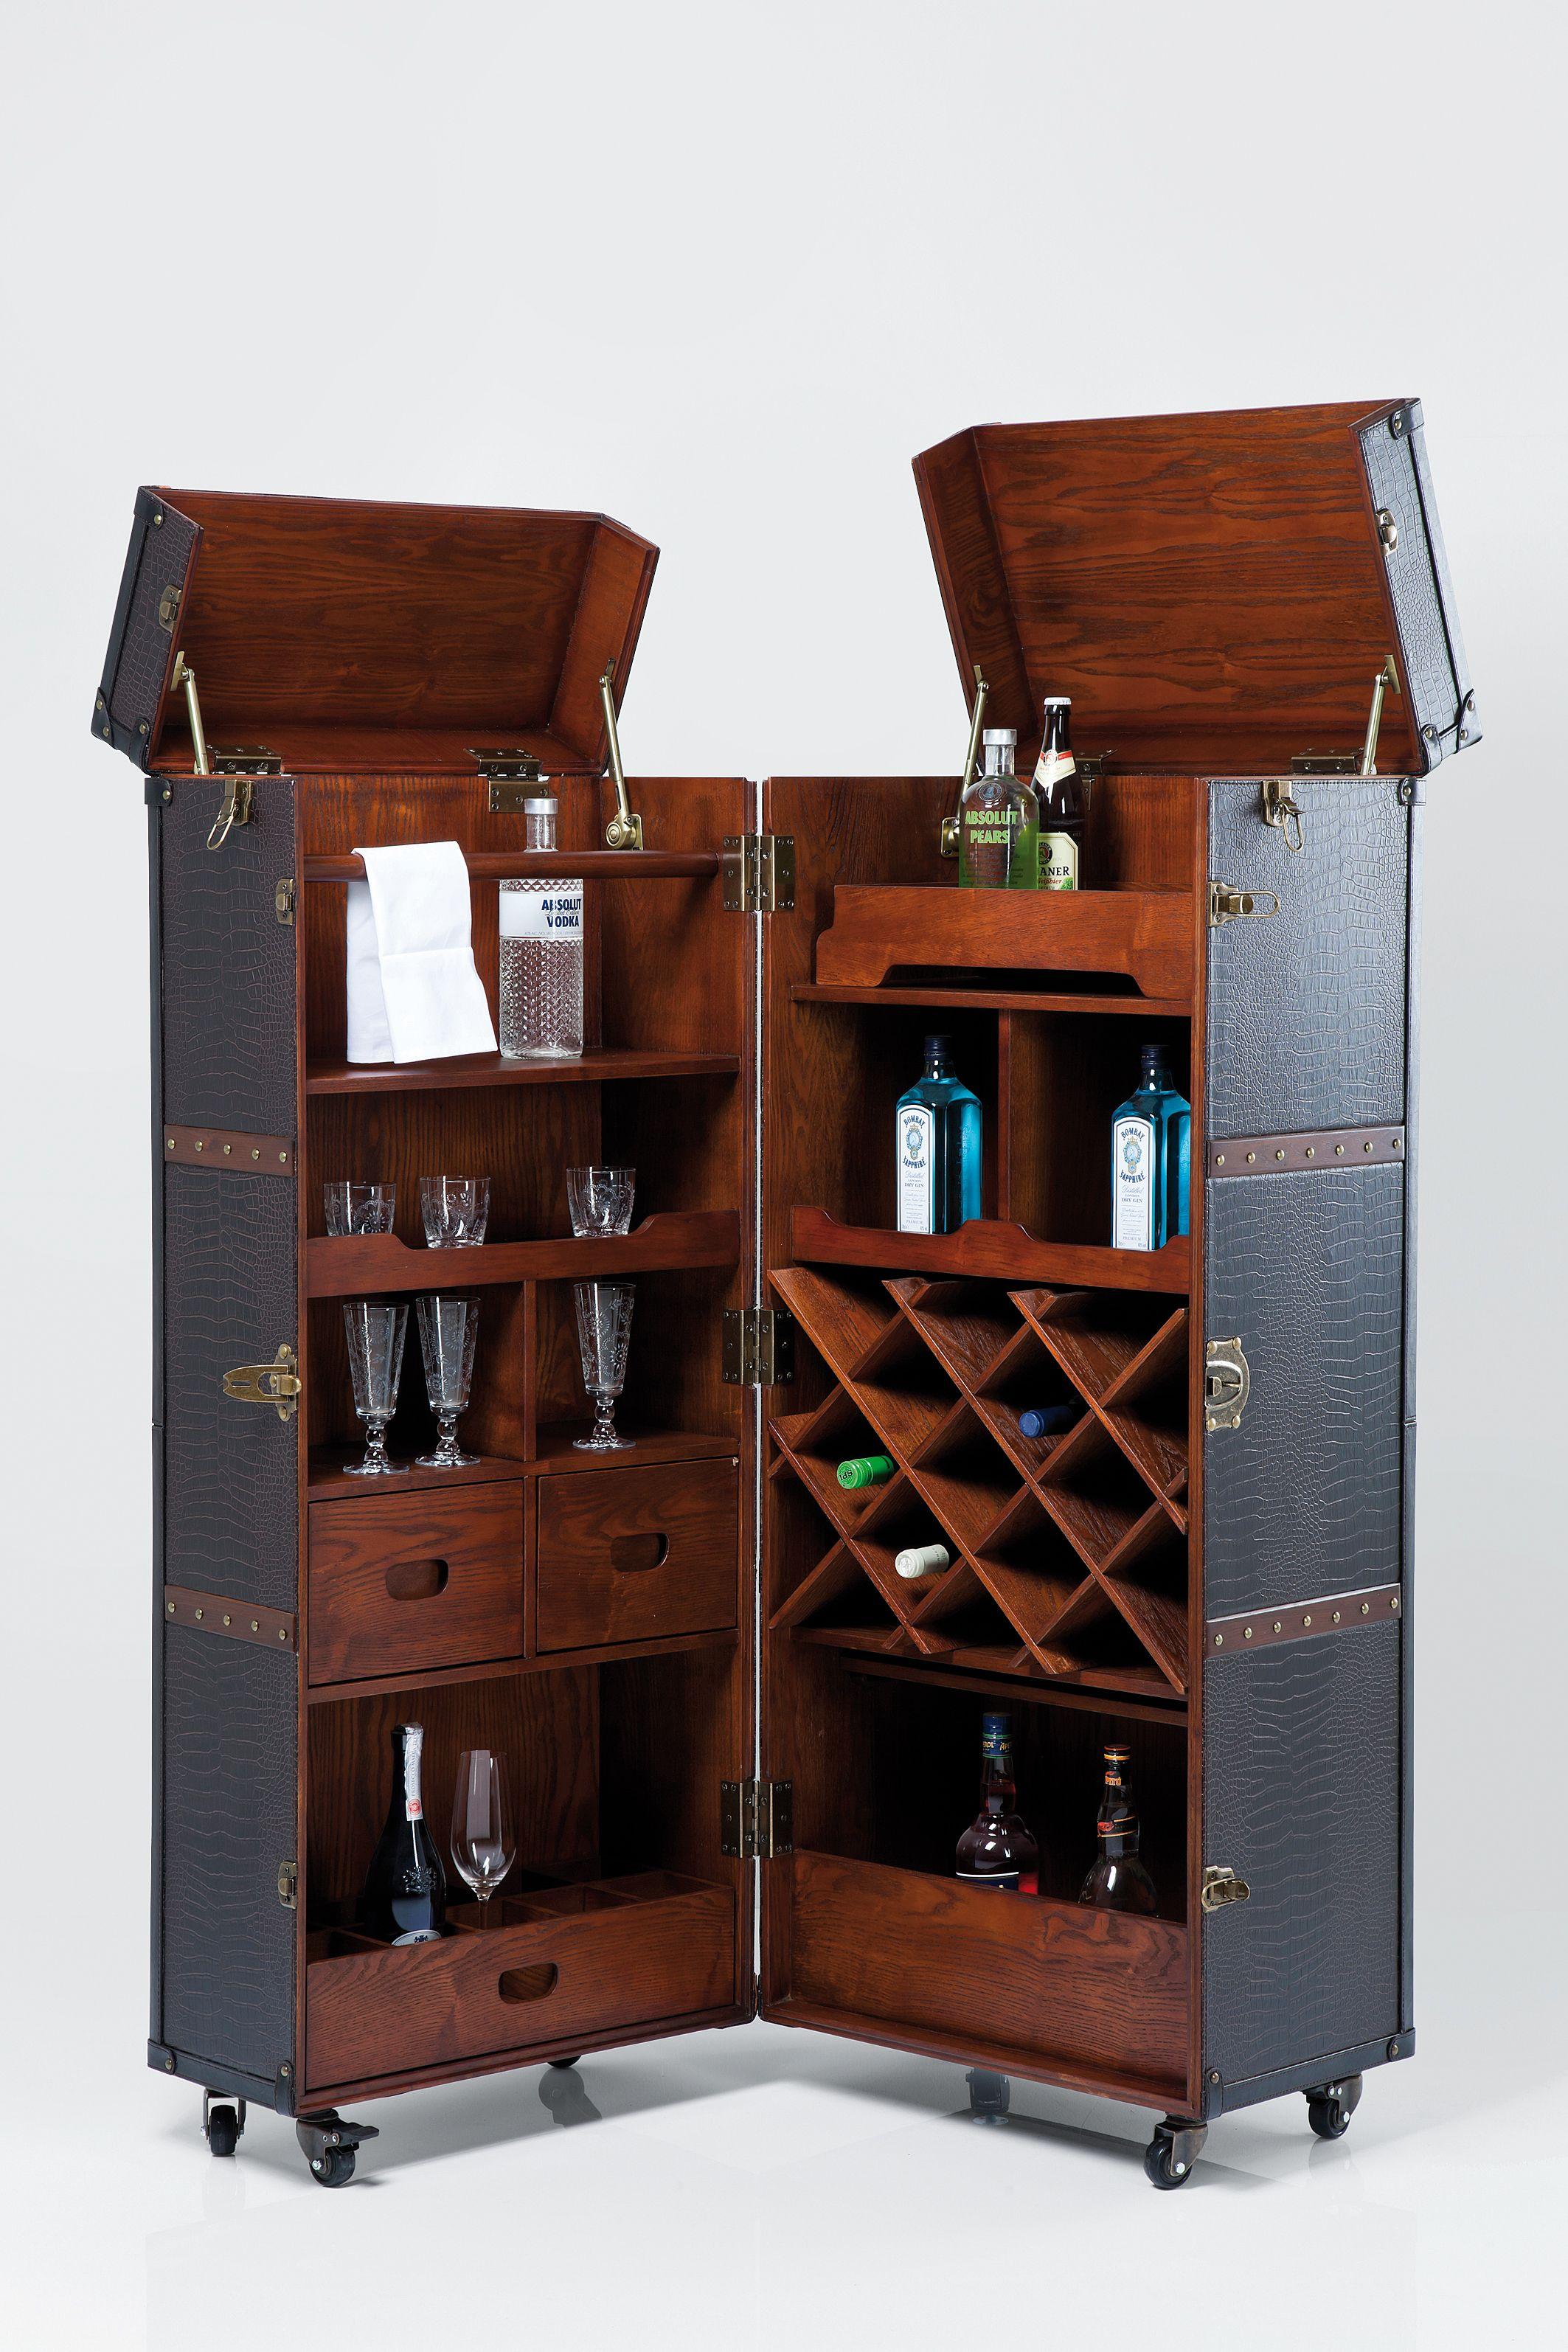 bar colonial 67 390 mueble bar ba l y bar. Black Bedroom Furniture Sets. Home Design Ideas